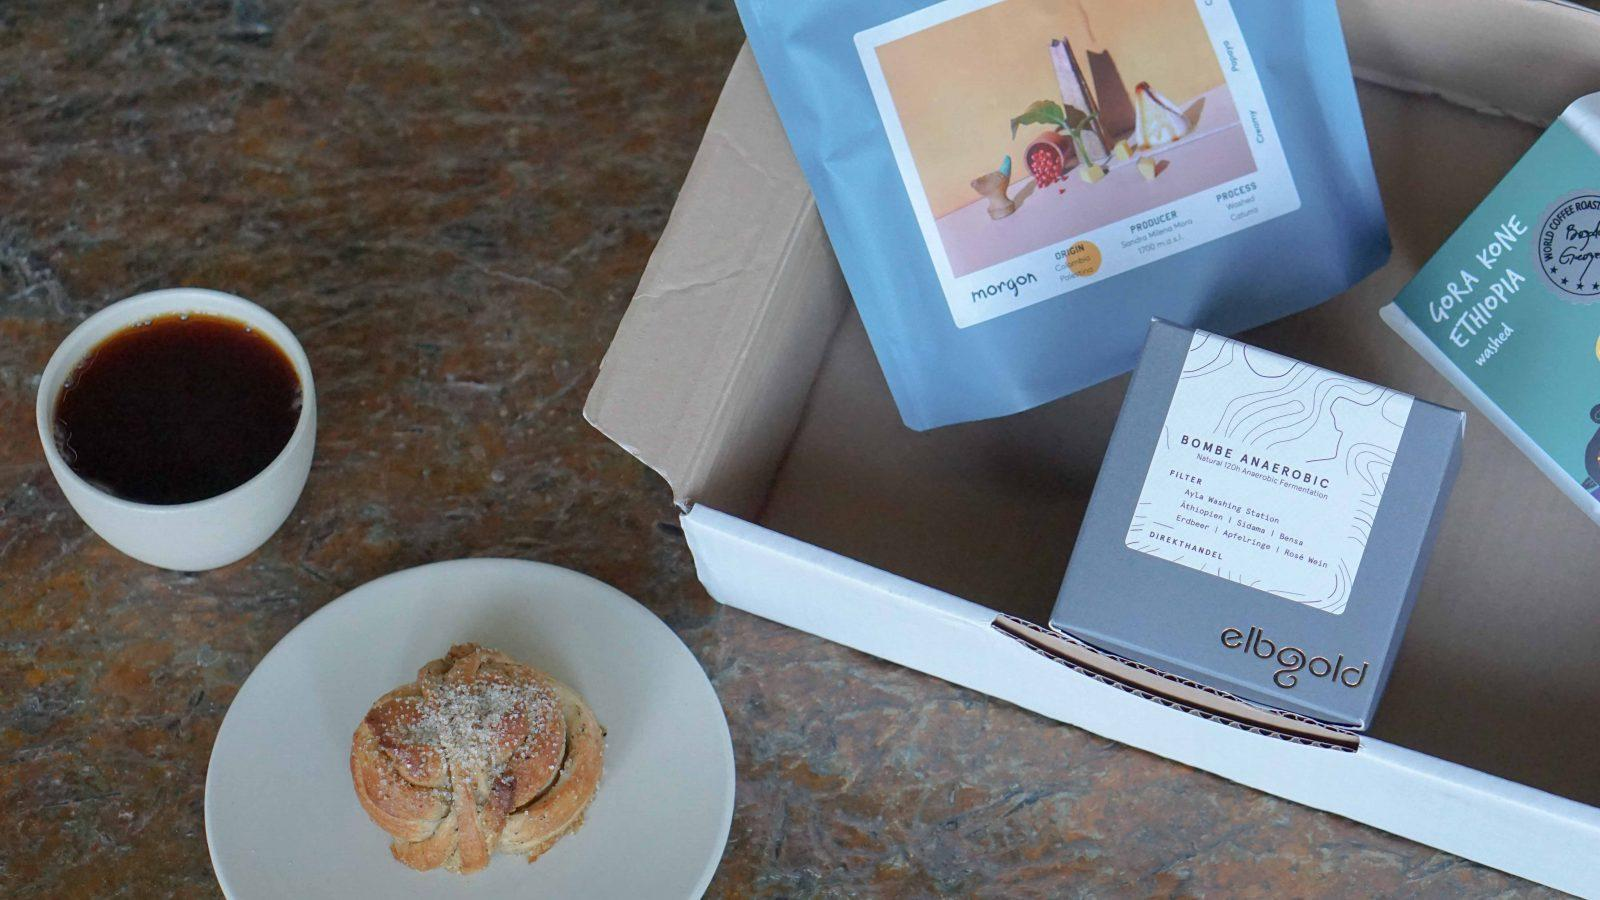 The-Coffeevine-October-coffee-box-10